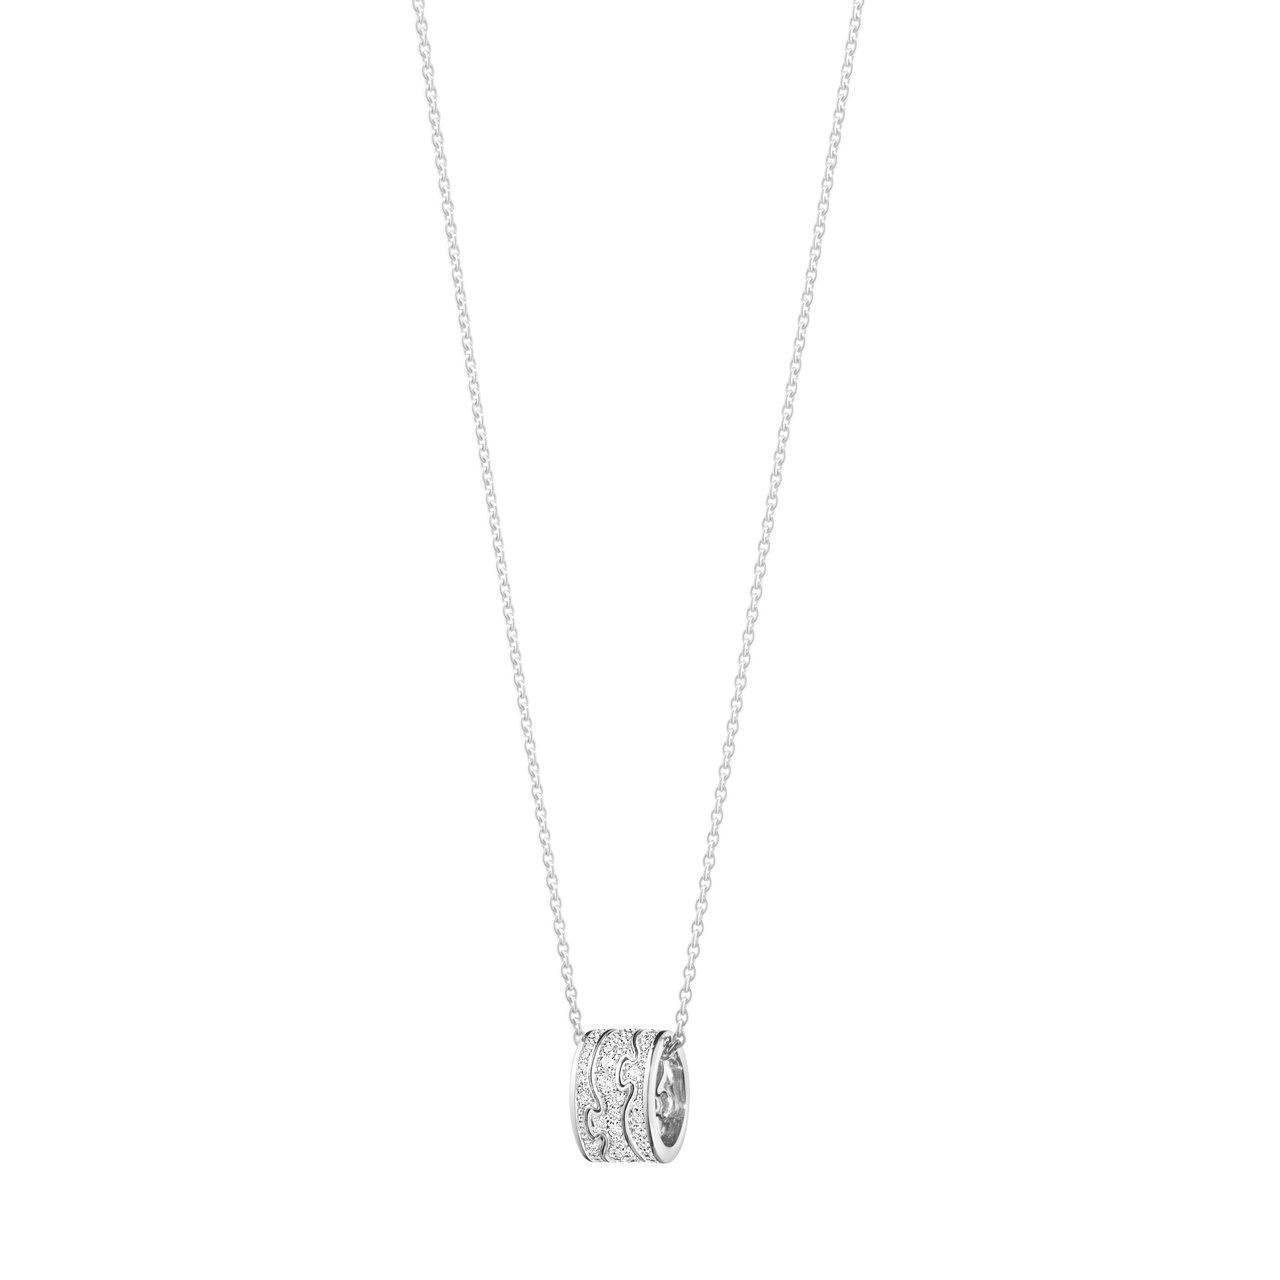 GEORG JENSEN NEW FUSION系列18K白金鋪鑲鑽石鍊墜,87,...